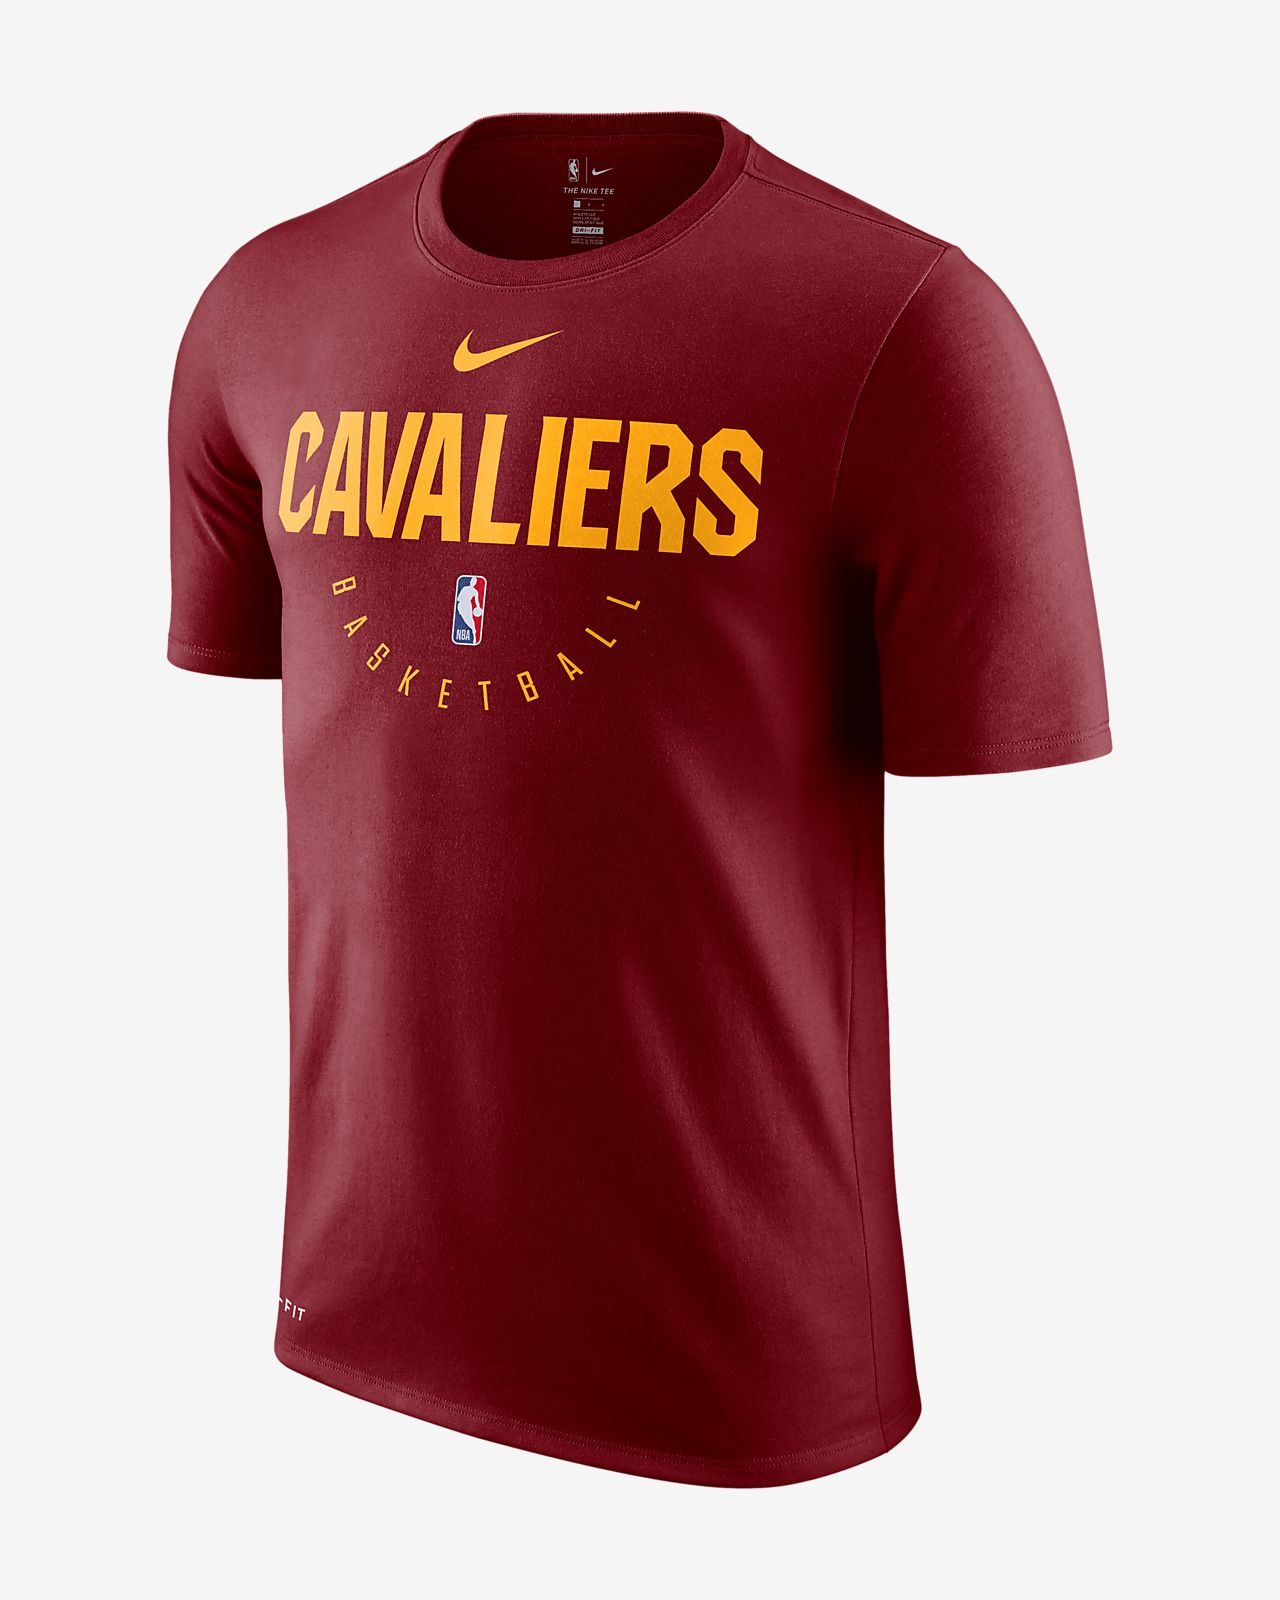 3bb4b25fe294 Cleveland Cavaliers Nike Dri-FIT Men s NBA T-Shirt. Nike.com GB